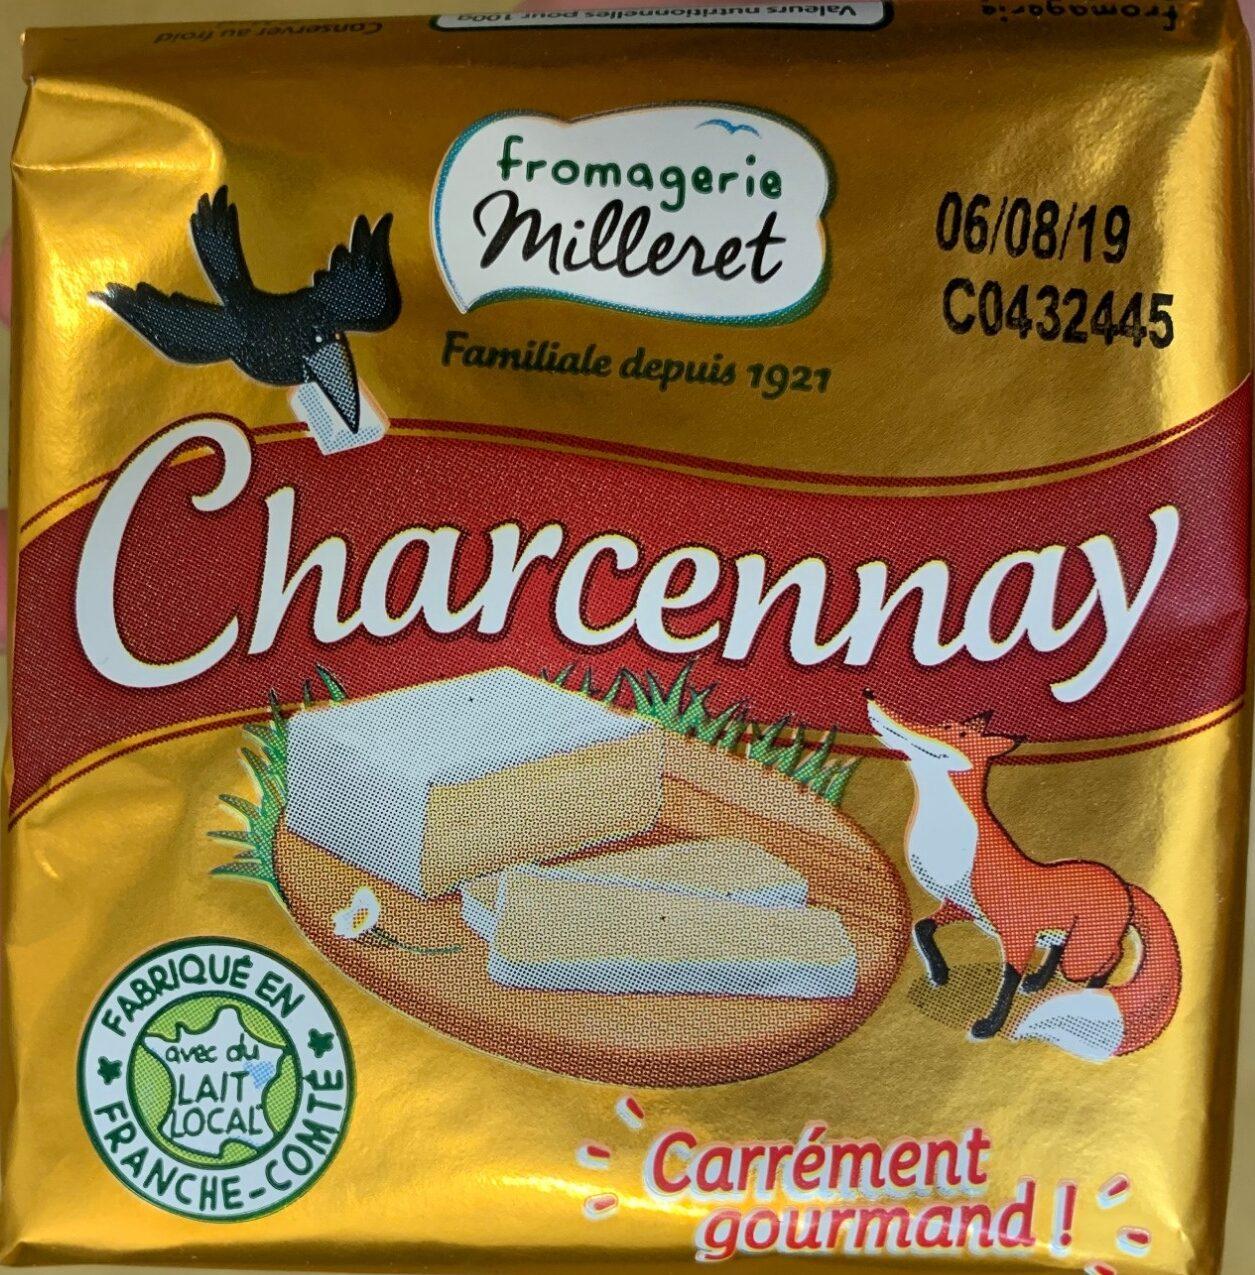 Charcennay (30% MG) - Product - fr